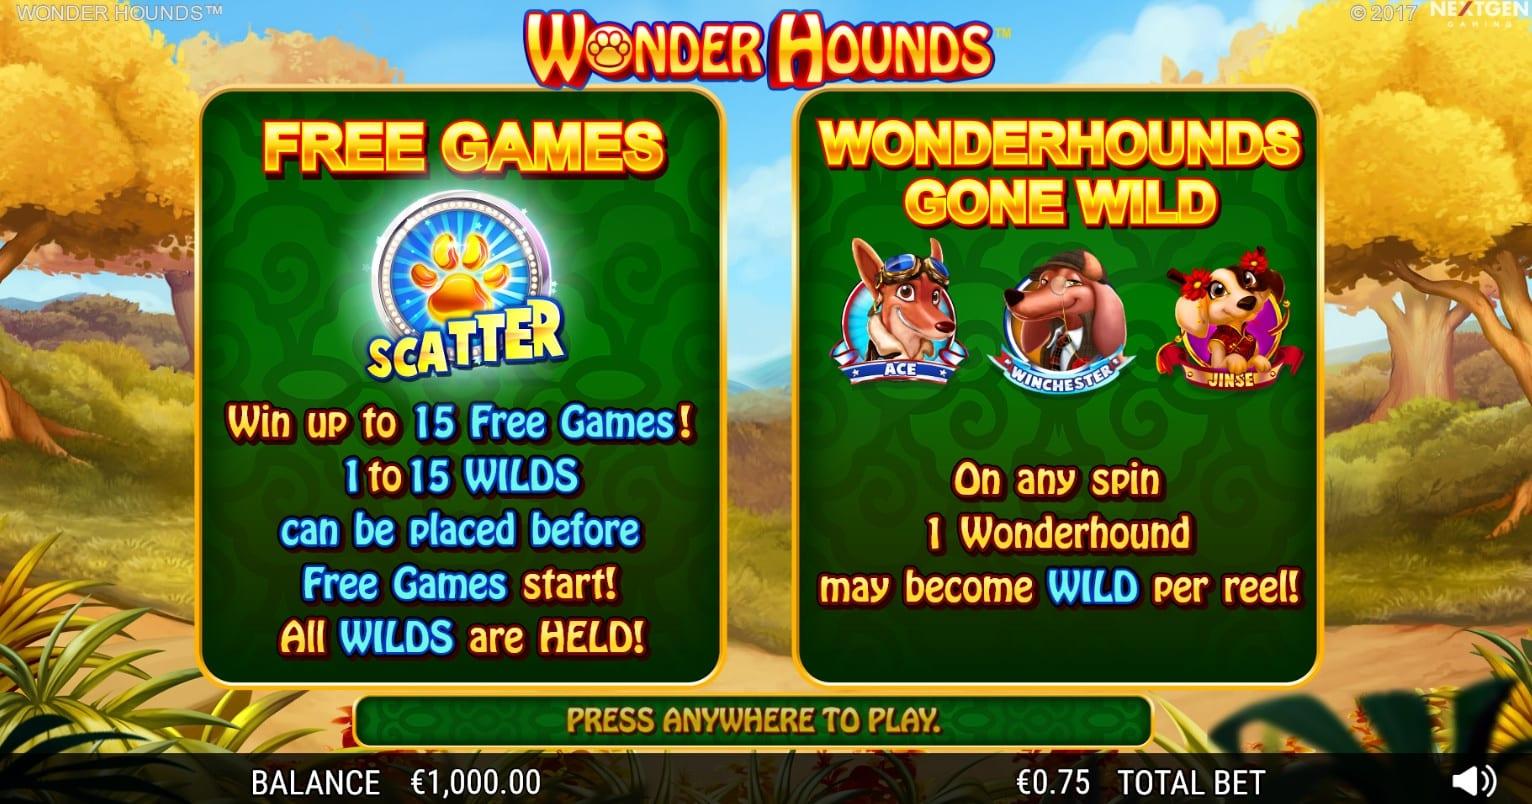 Wonder Hounds paytable